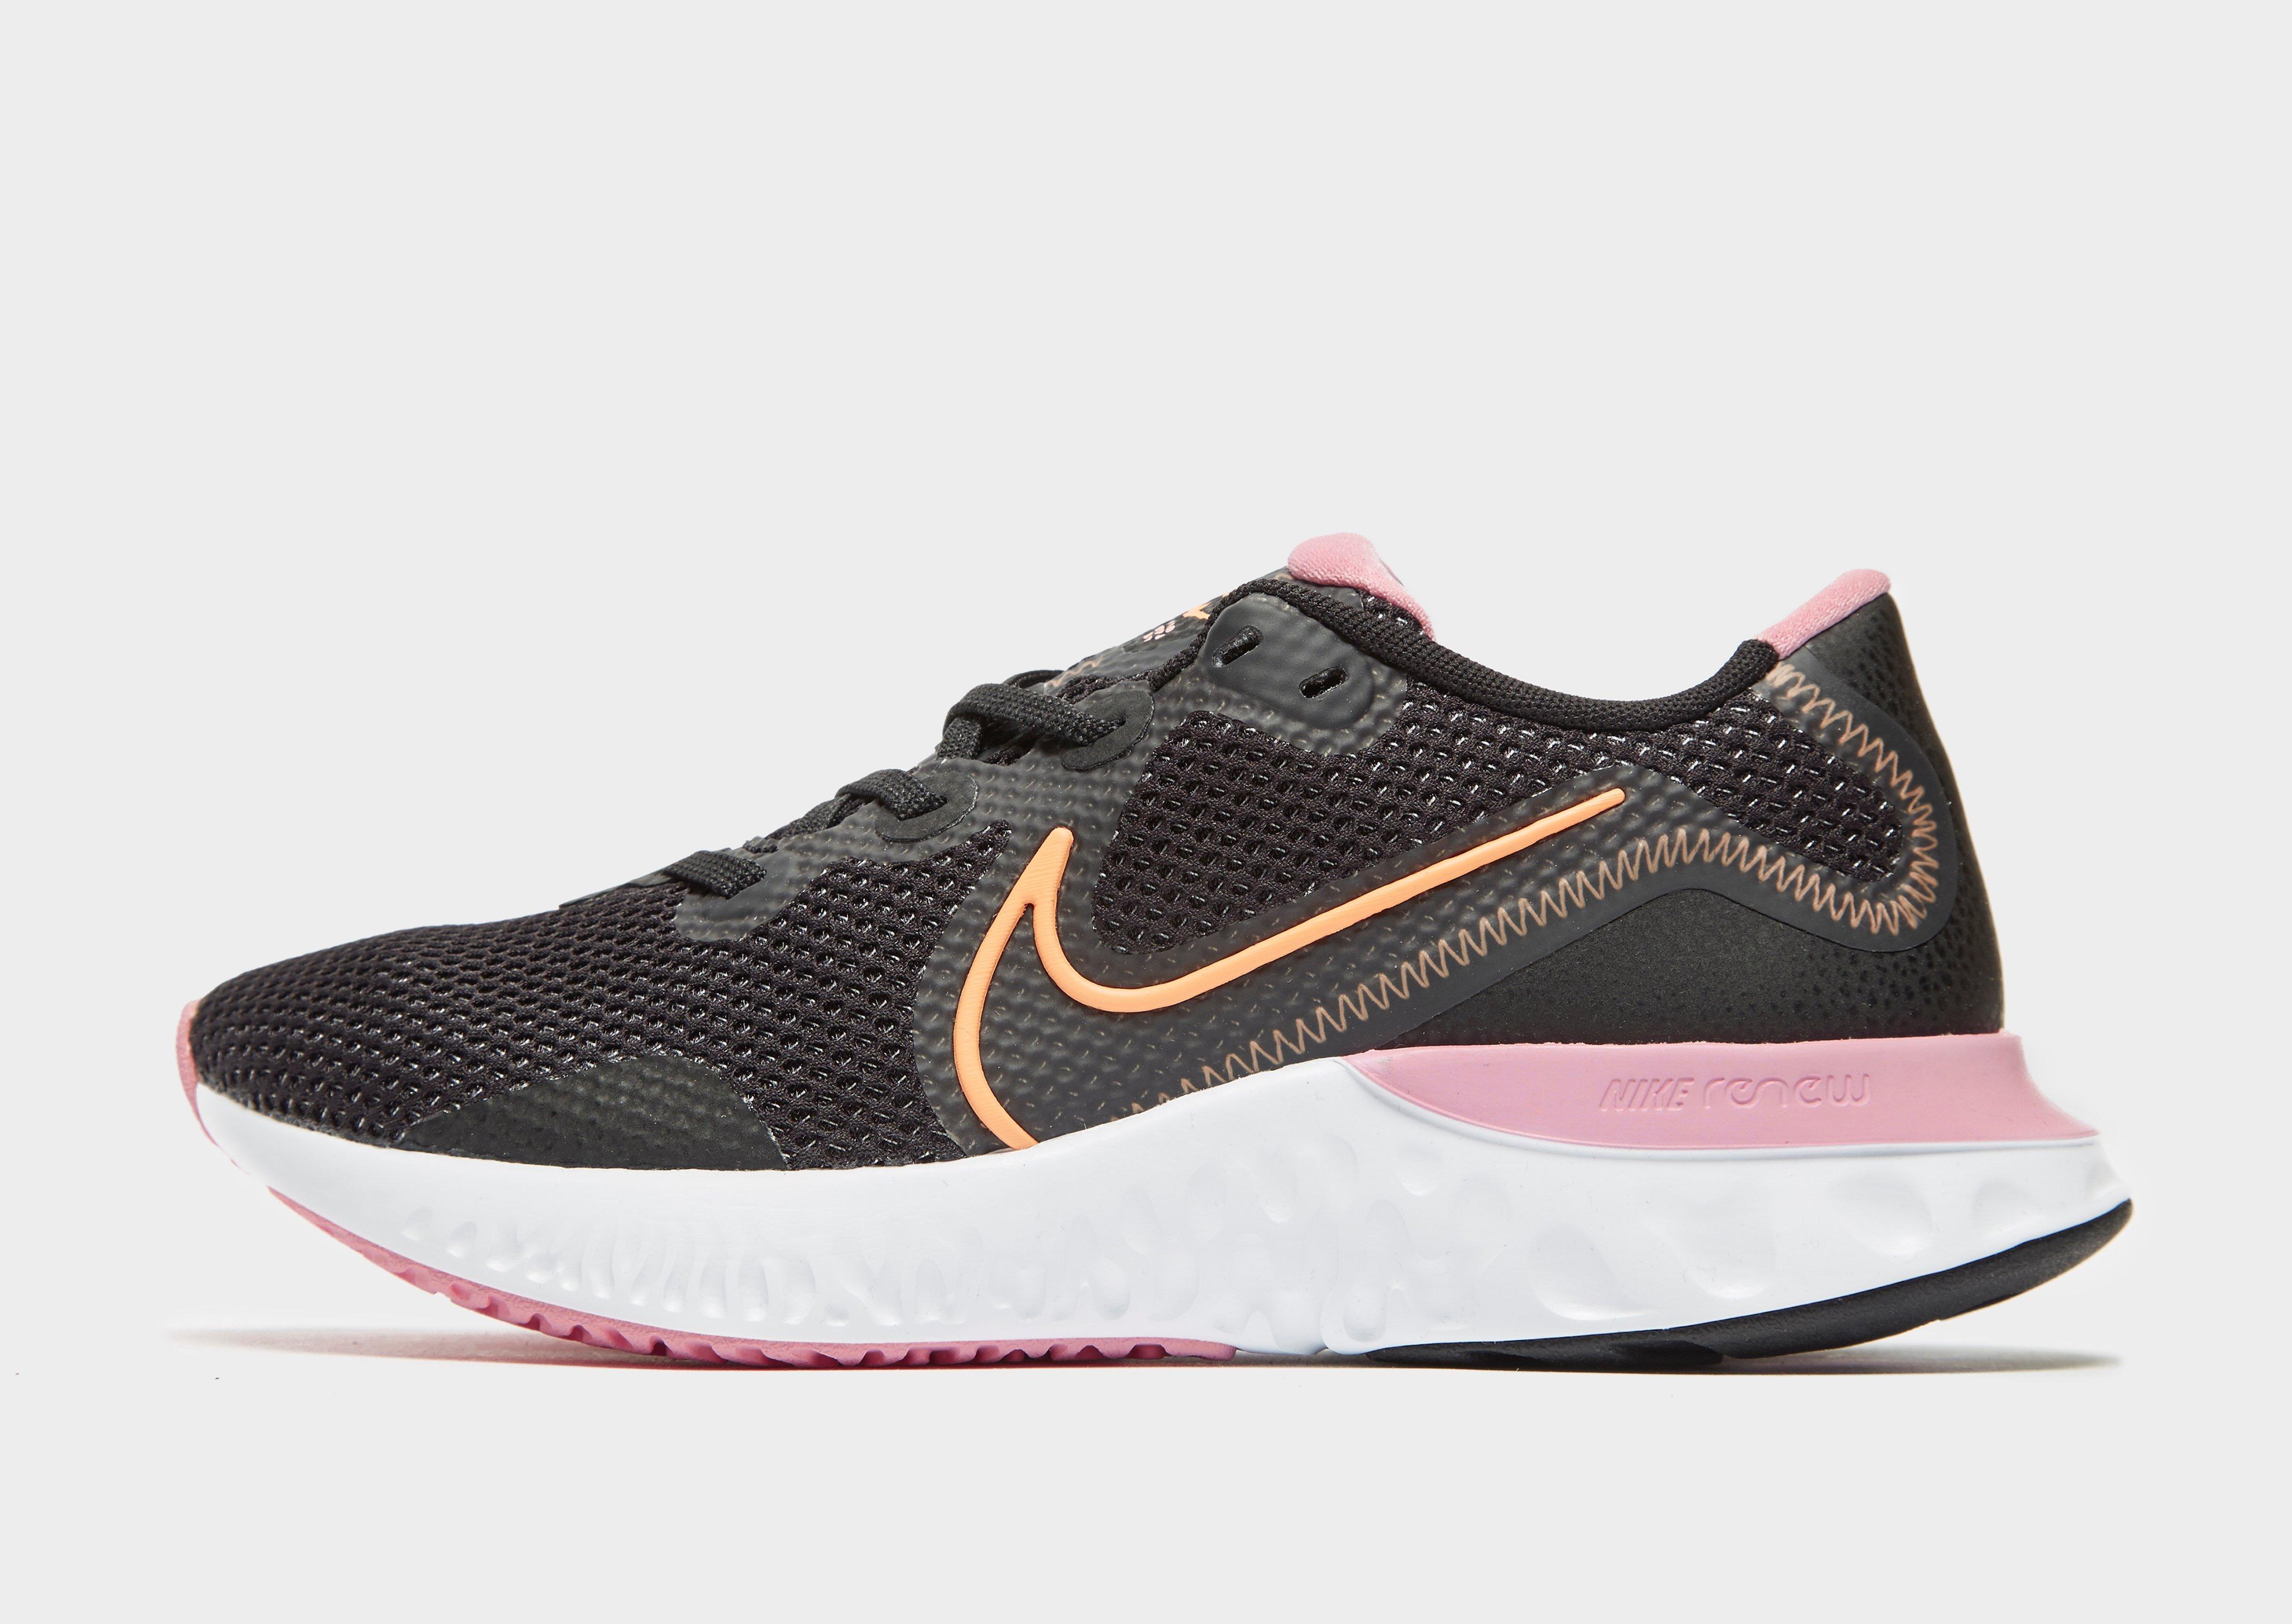 Nike Renew Run Femme   JD Sports